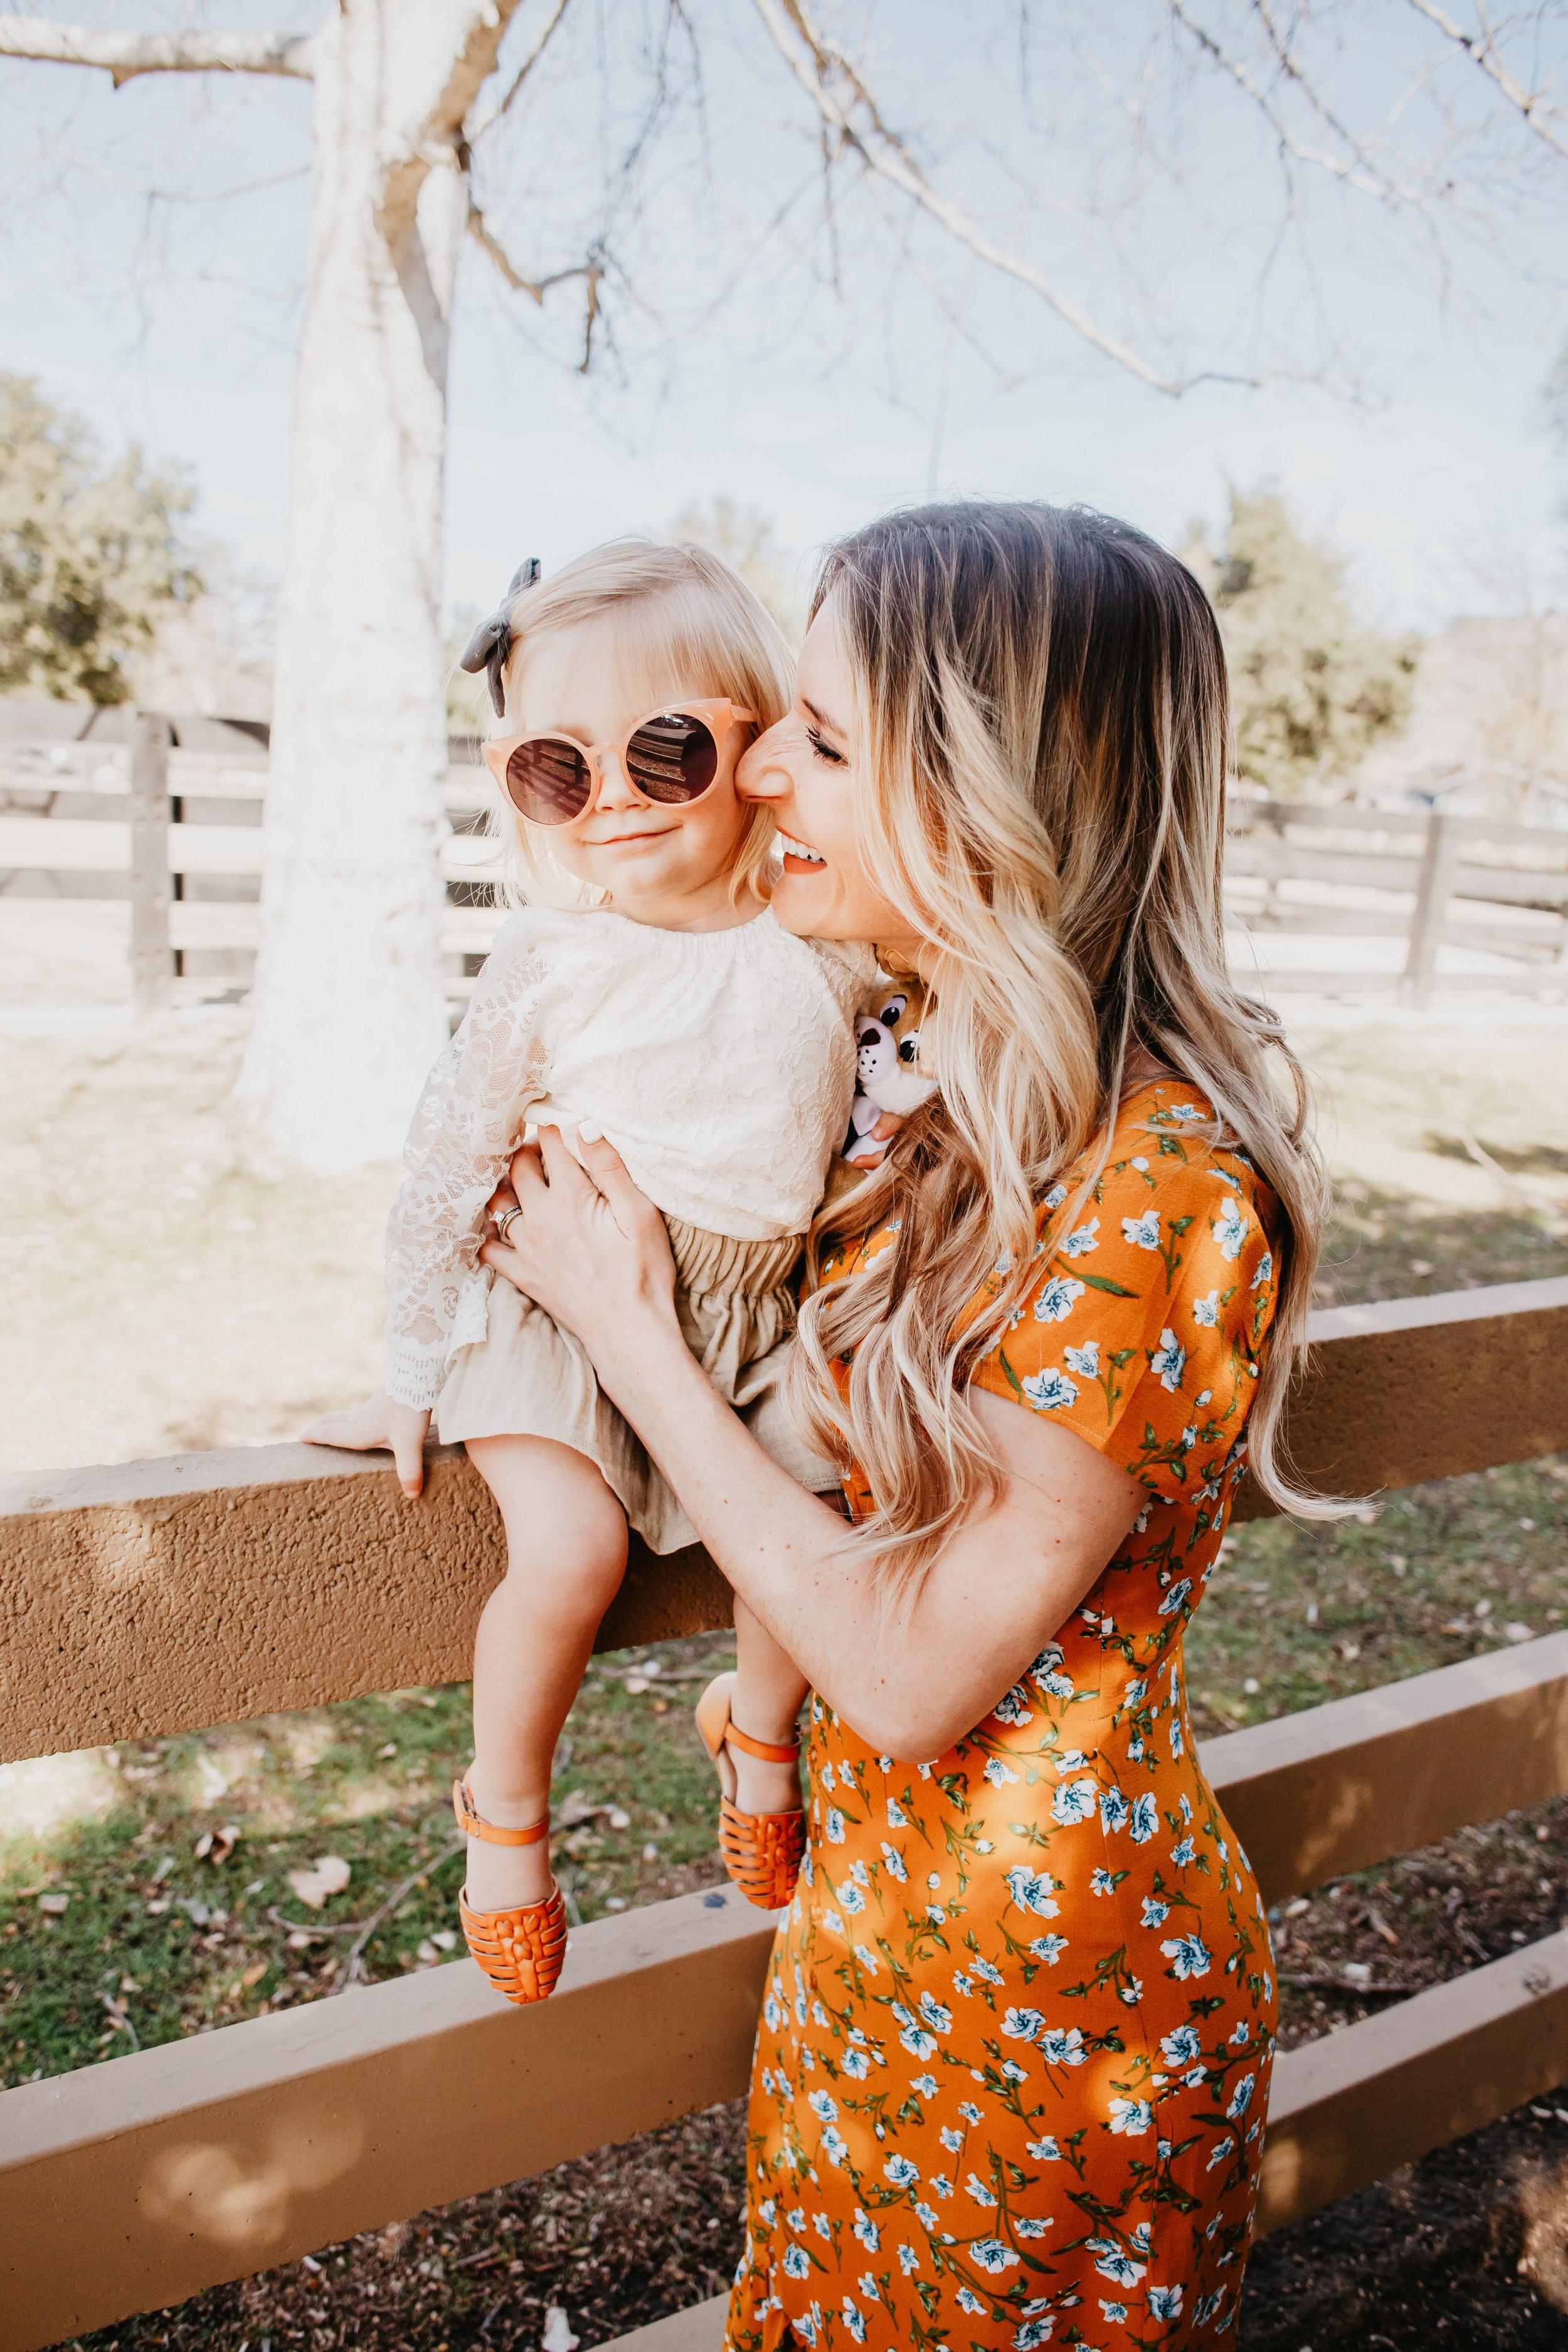 Mommy Blogger - The Overwhelmed Mommy